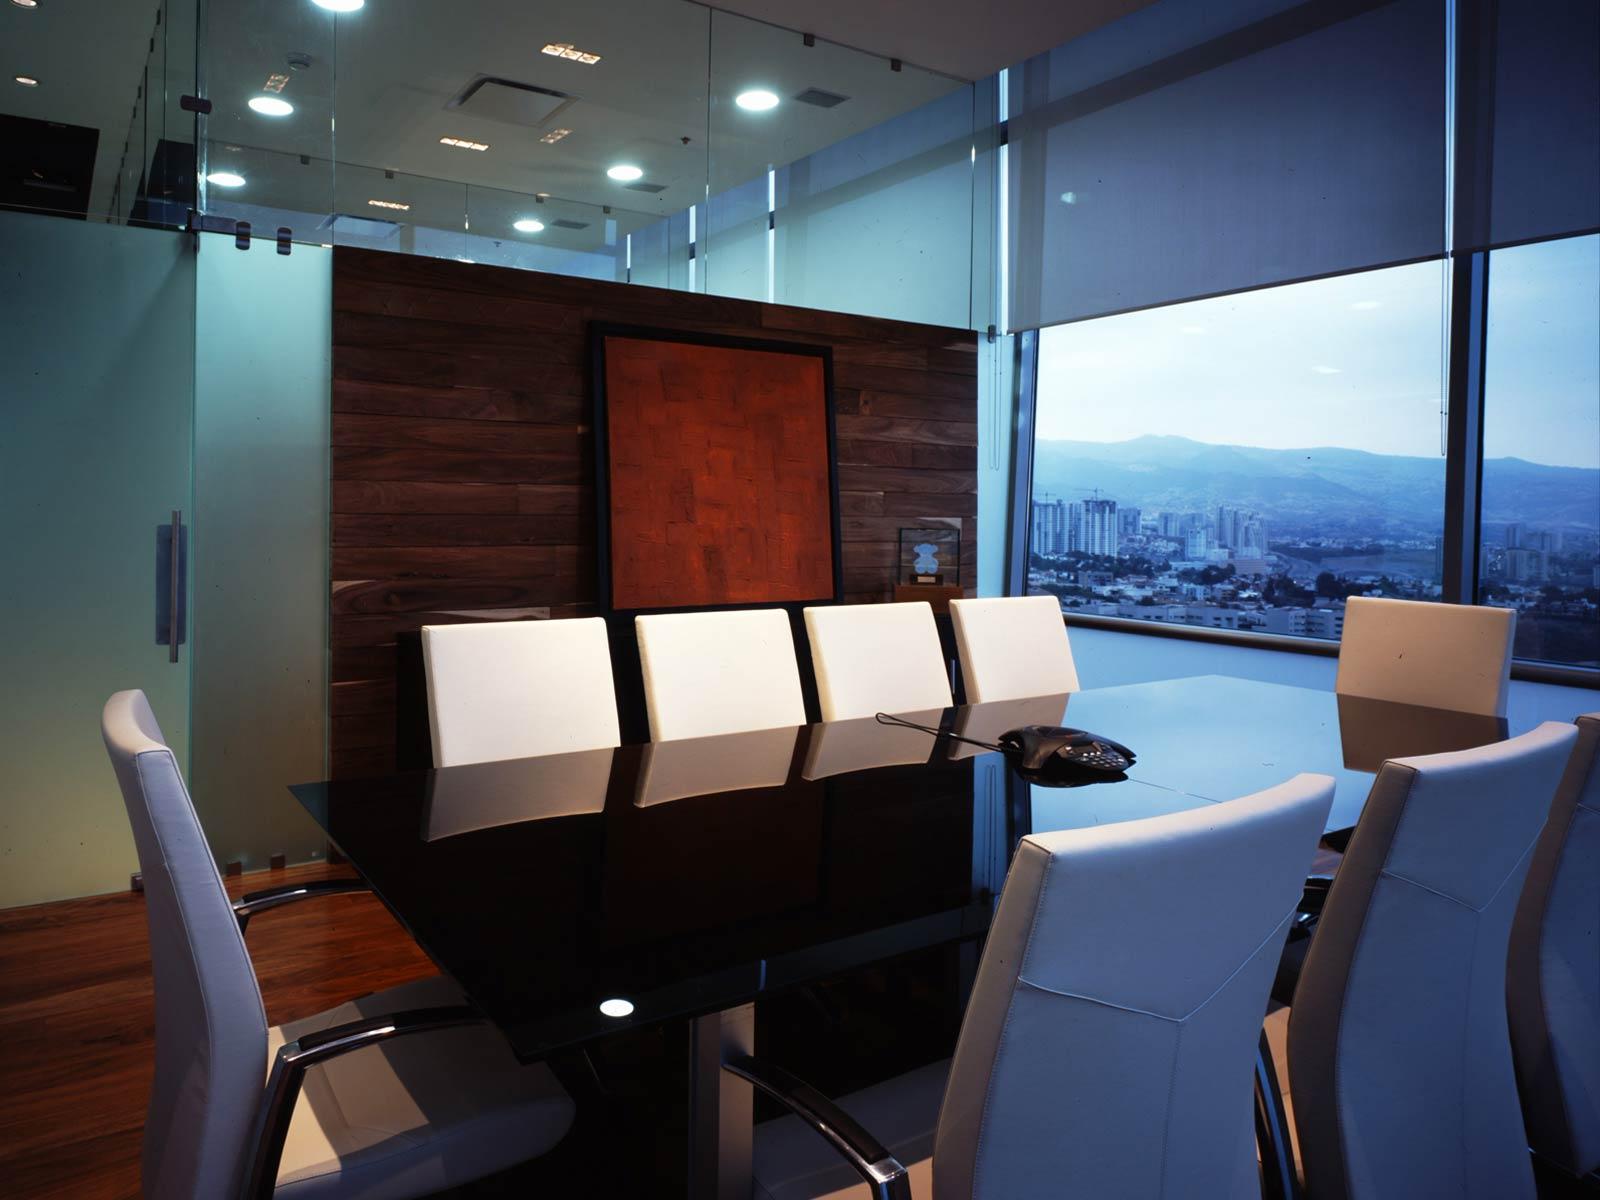 Grupo arquitech interiorismo oficinas oficinas tous for Interiorismo oficinas